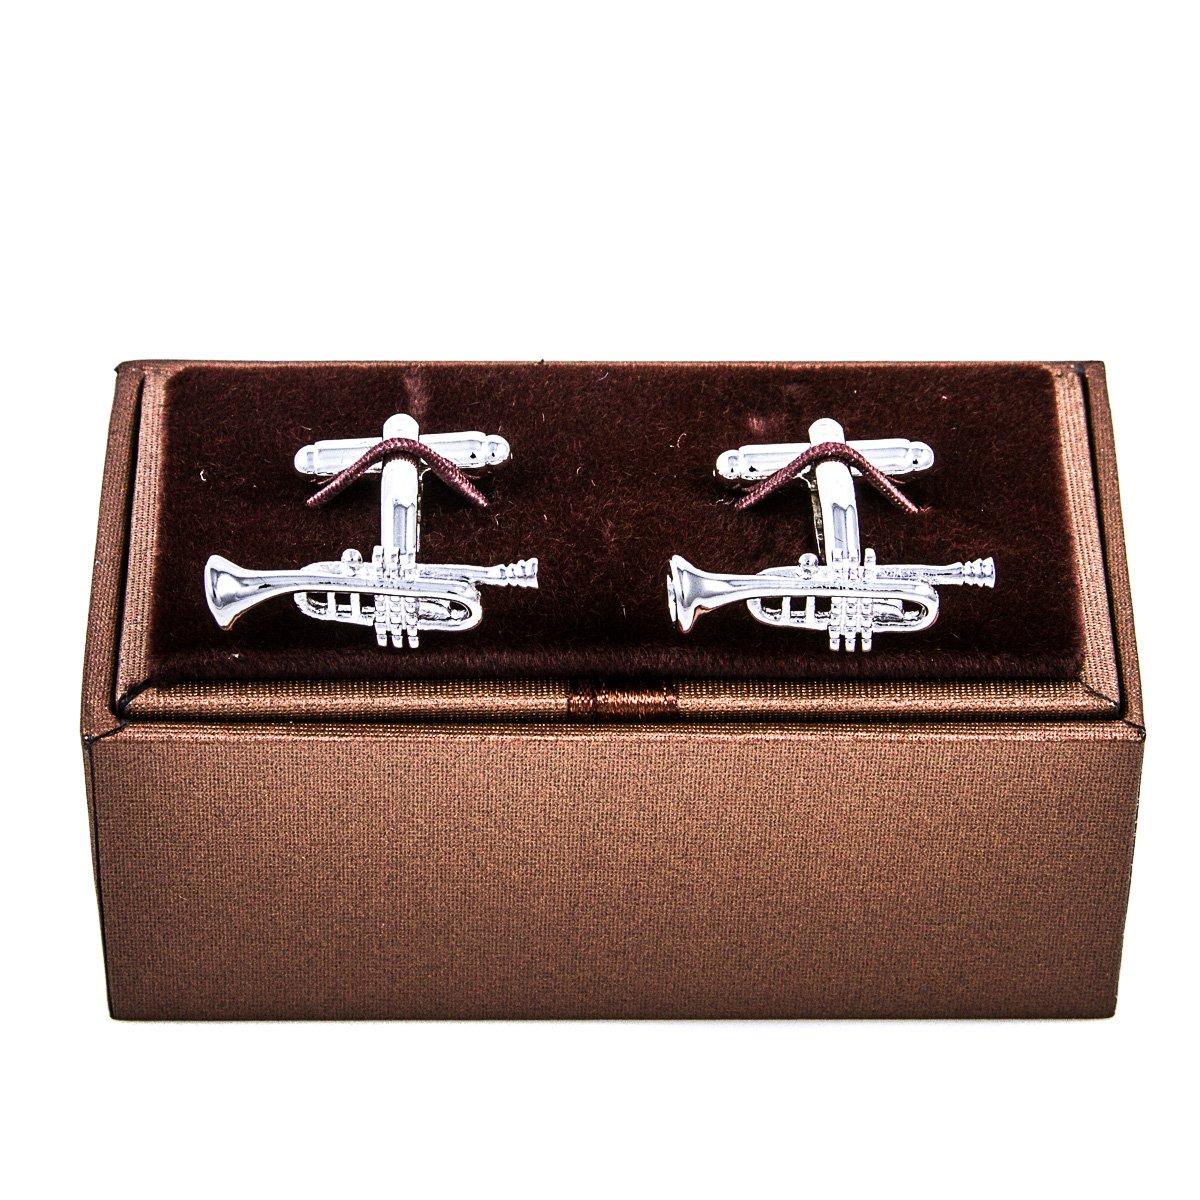 MRCUFF Trumpet Jazz Music Pair Cufflinks in a Presentation Gift Box & Polishing Cloth